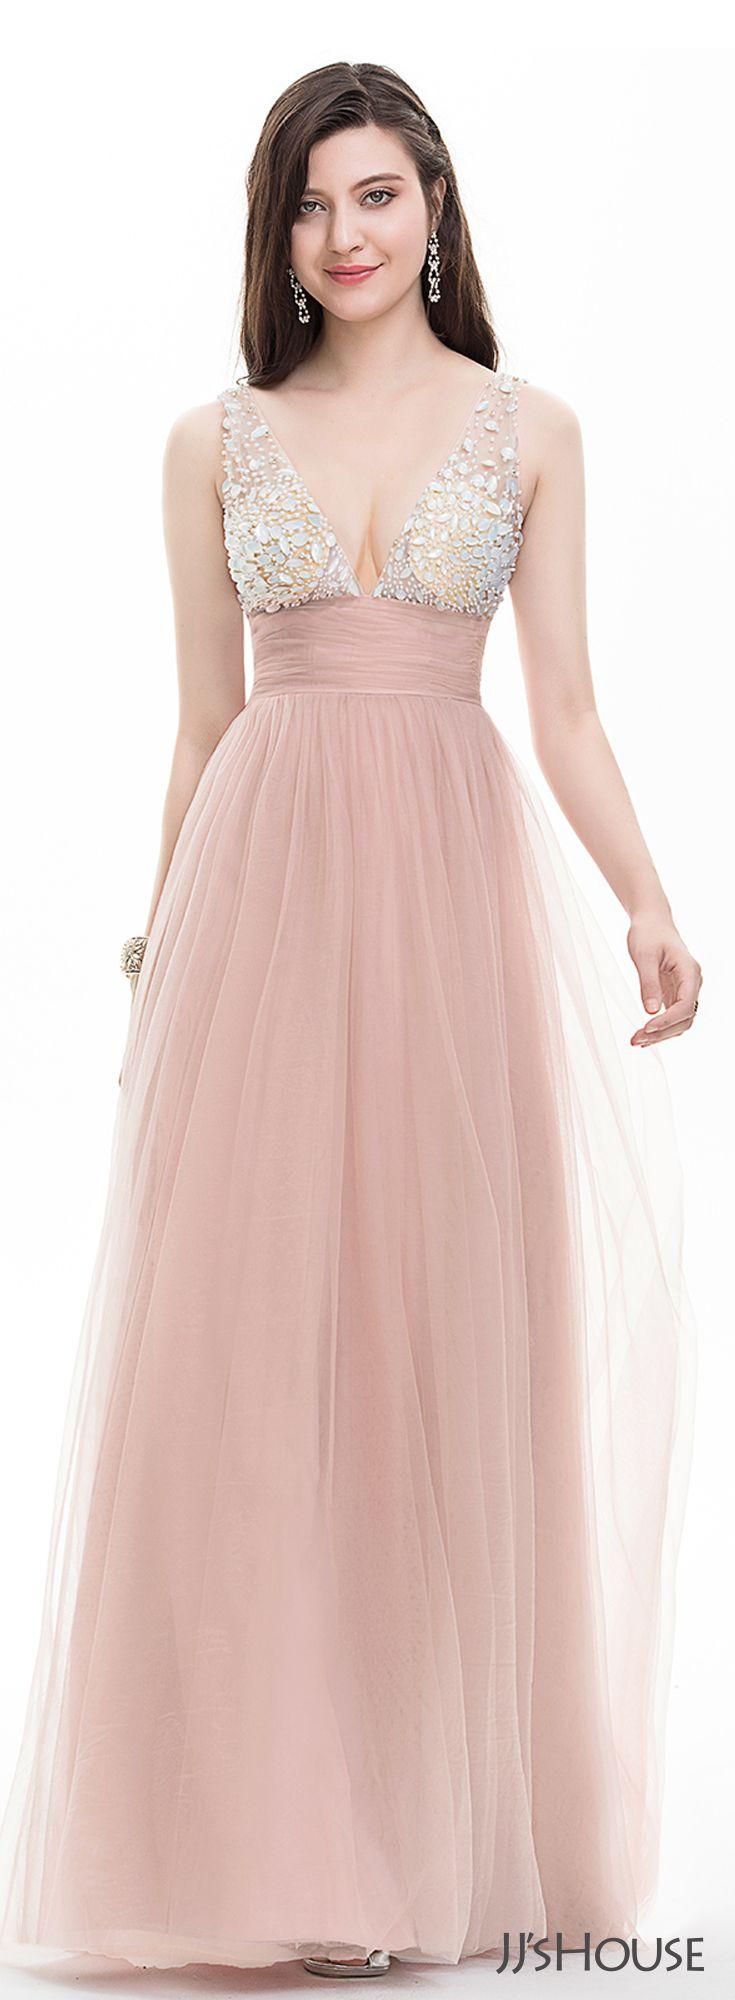 Famoso Prom Girl Simplemente Vestidos Molde - Colección de Vestidos ...